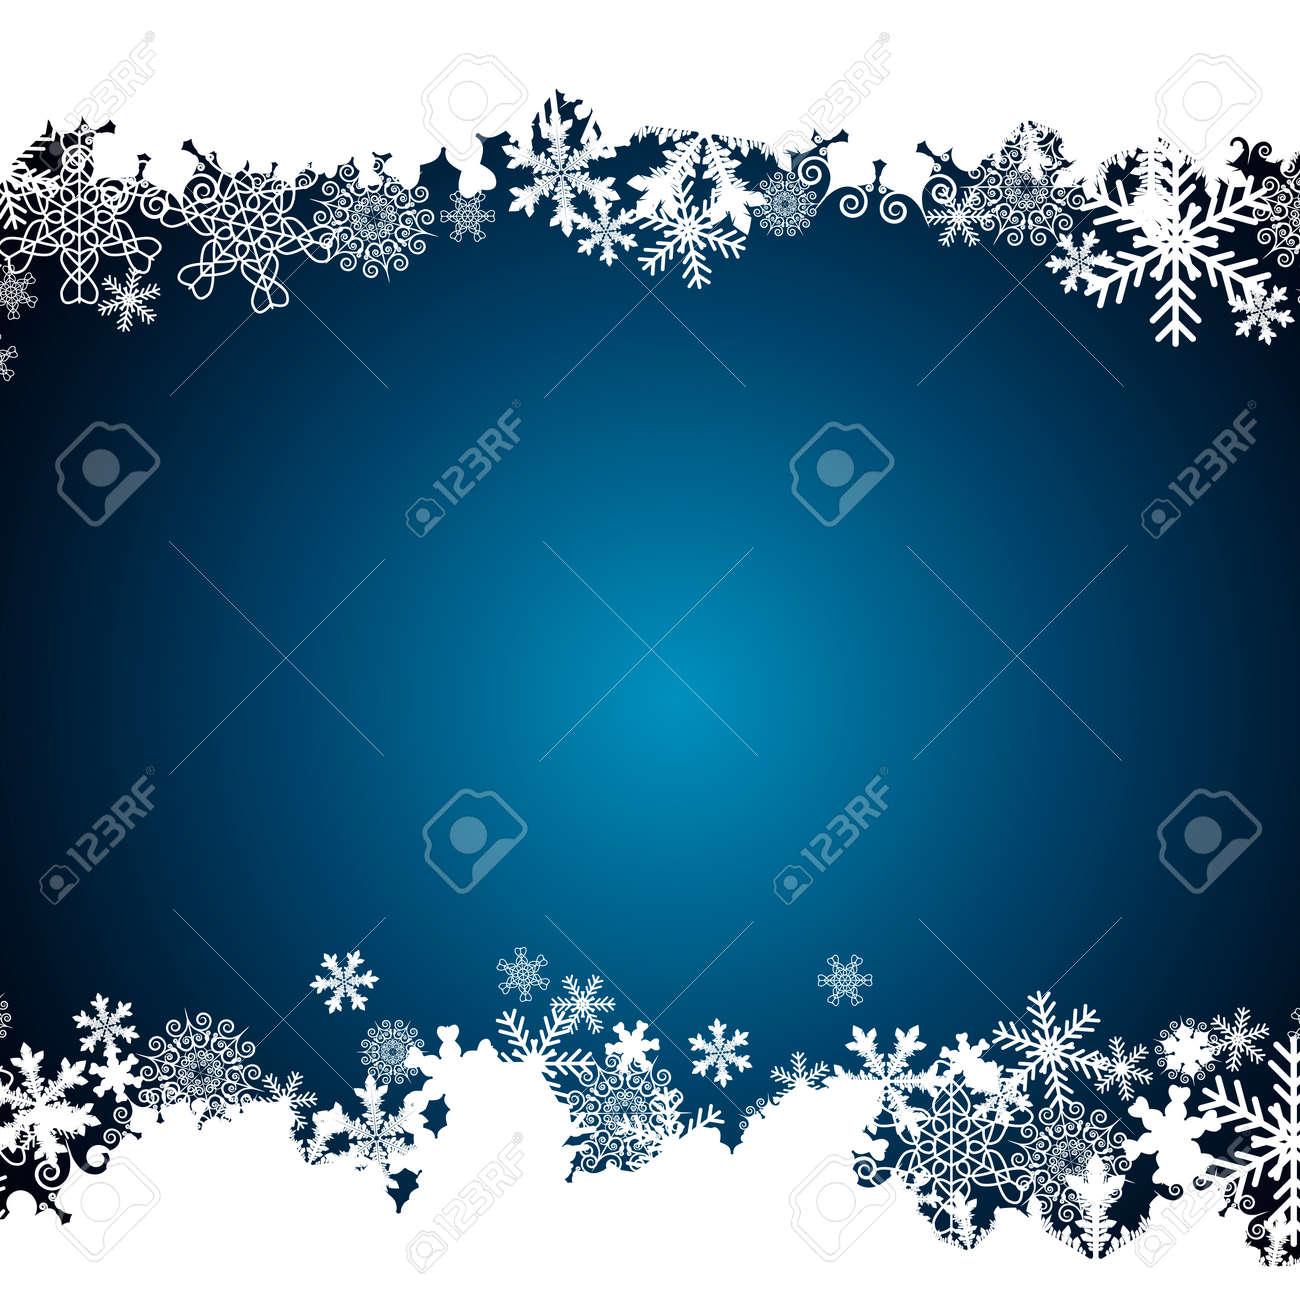 Christmas border, snowflake design background. - 156079867